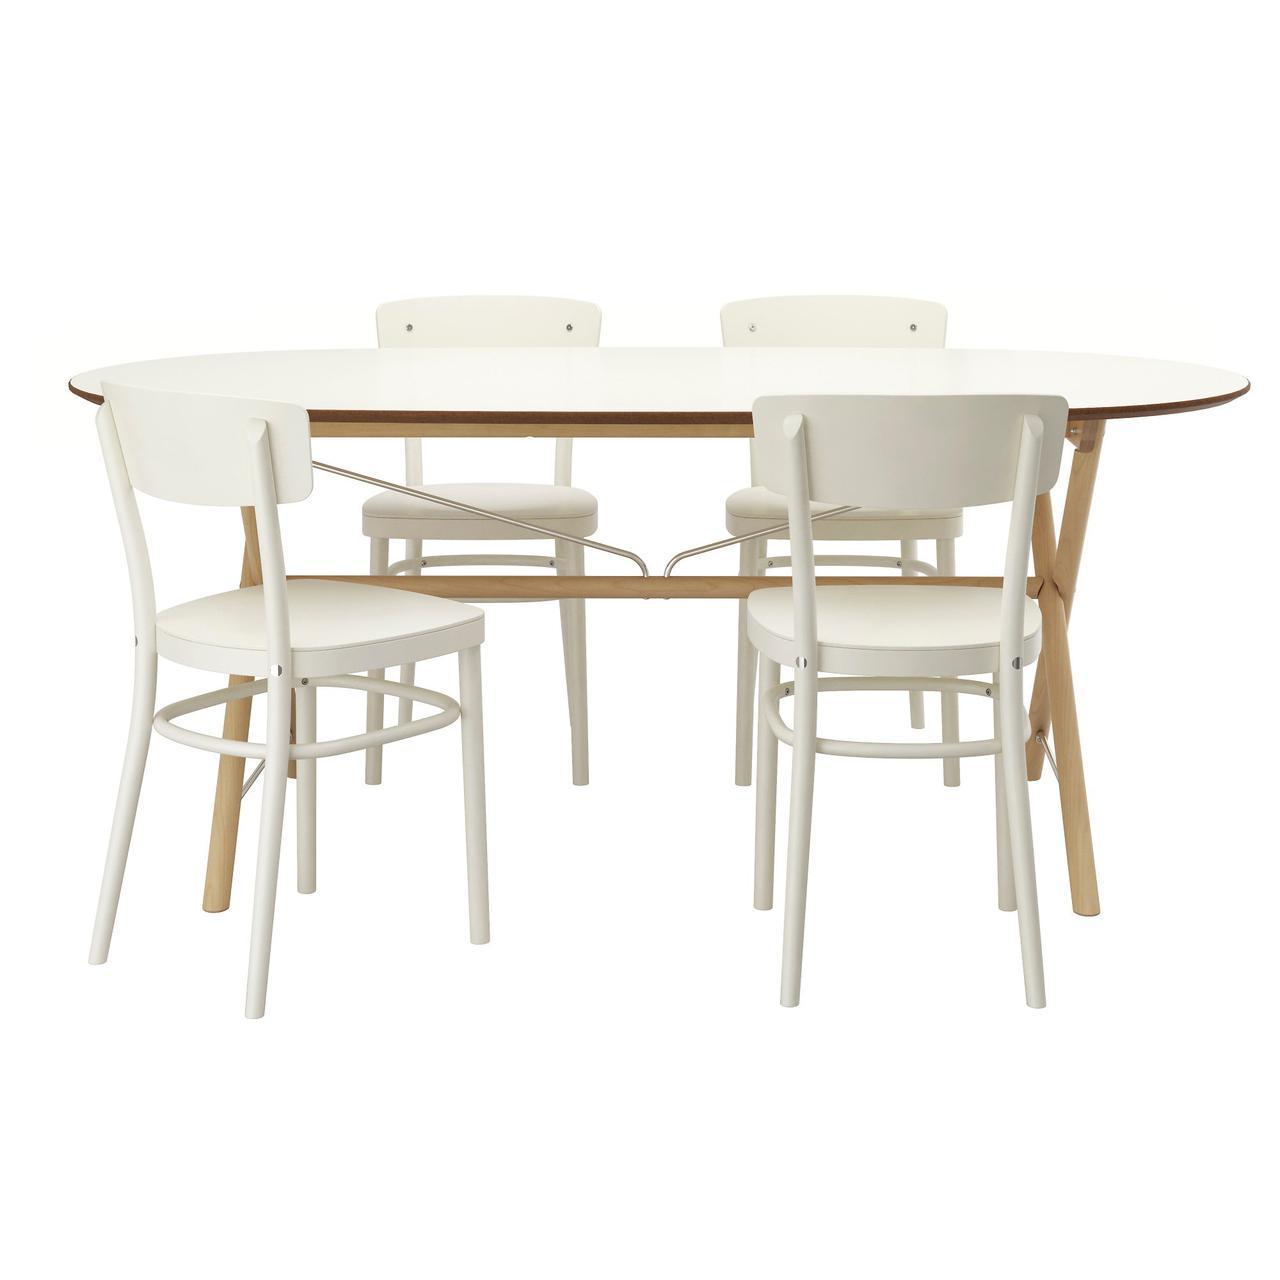 IKEA SLAHULT/DALSHULT / IDOLF (792.298.15) Стол и 4 стула, береза, белая